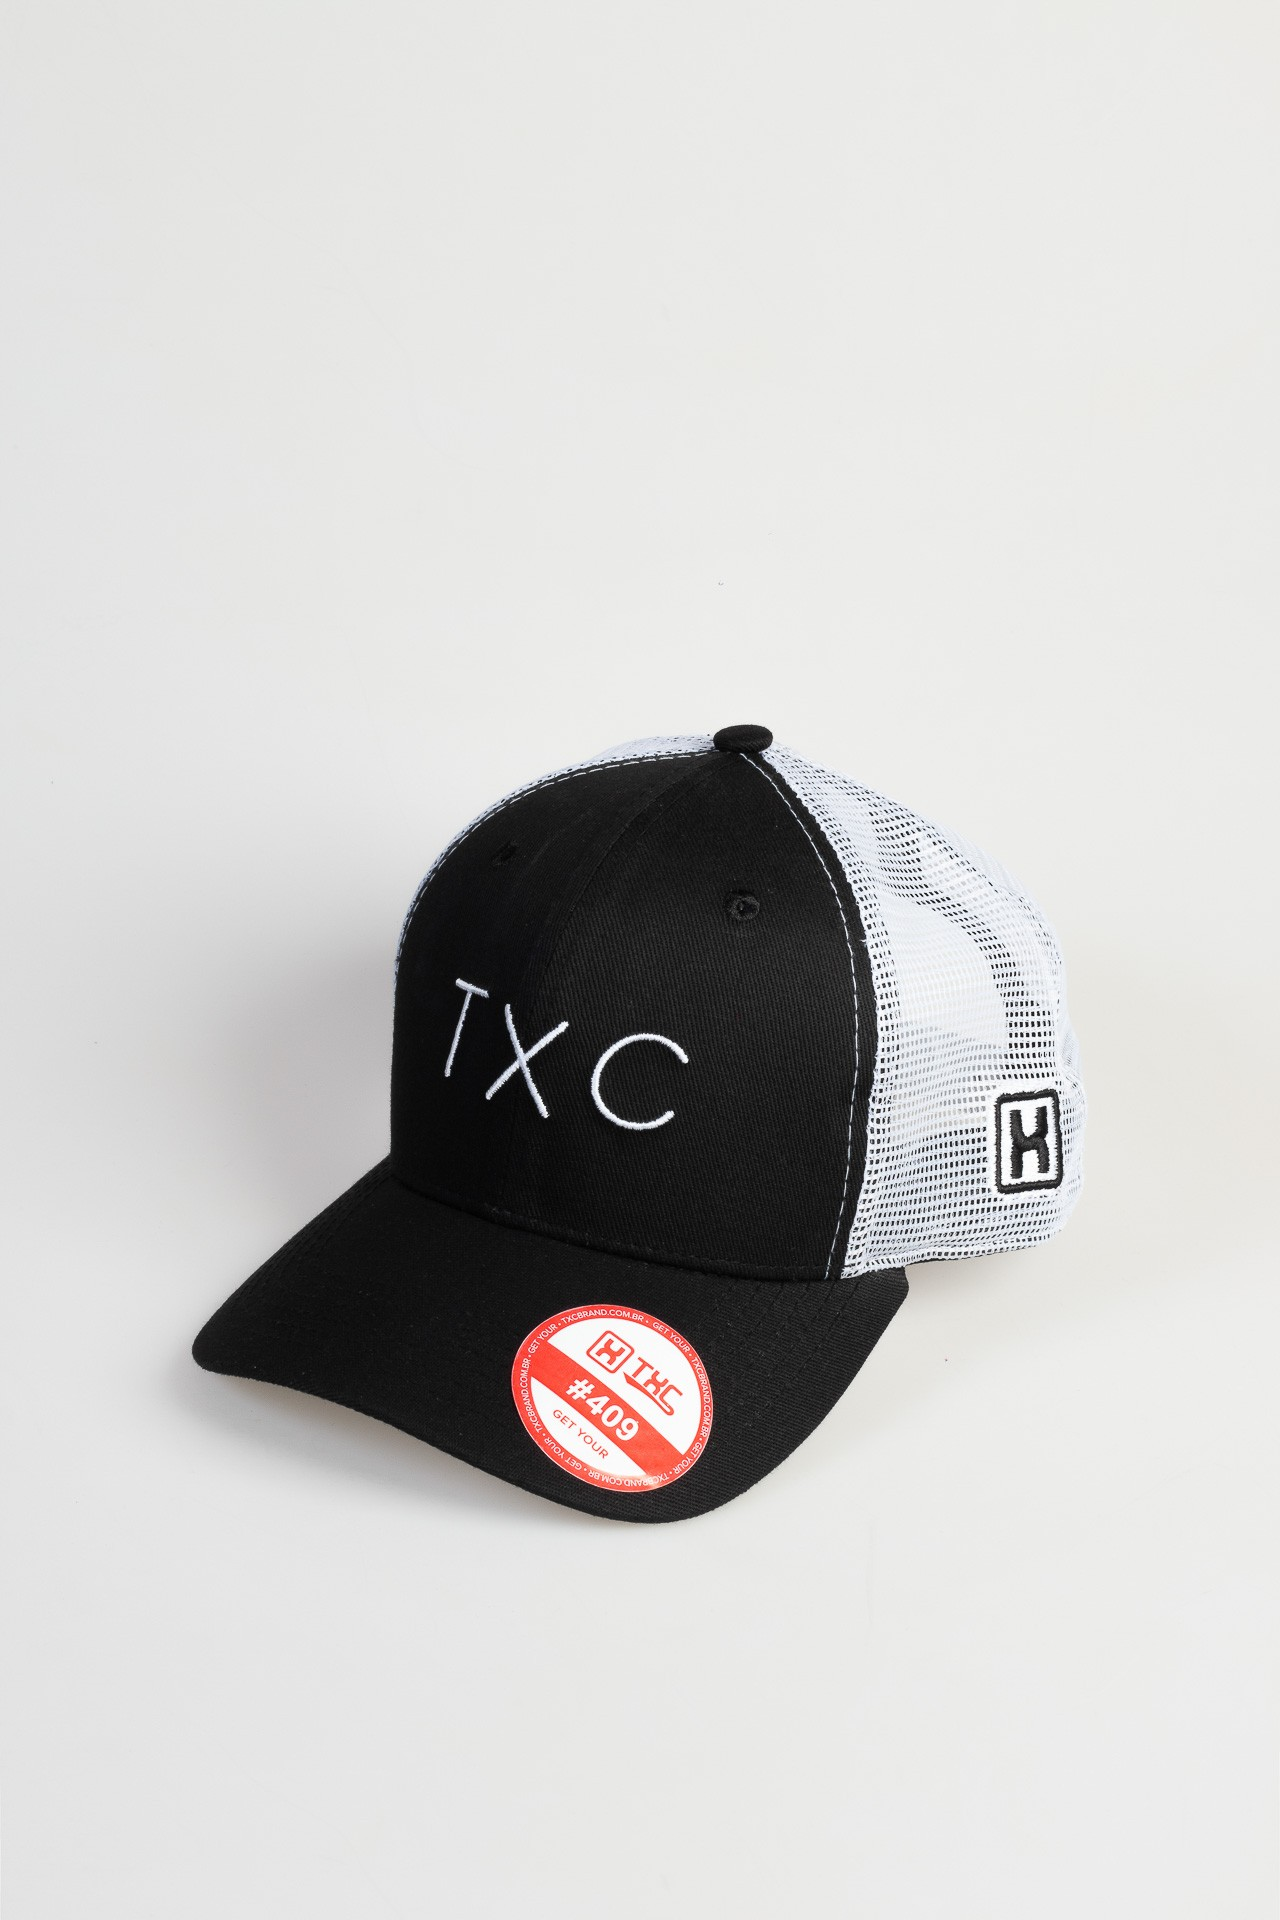 Boné TXC Brand Aba Curva  1047C